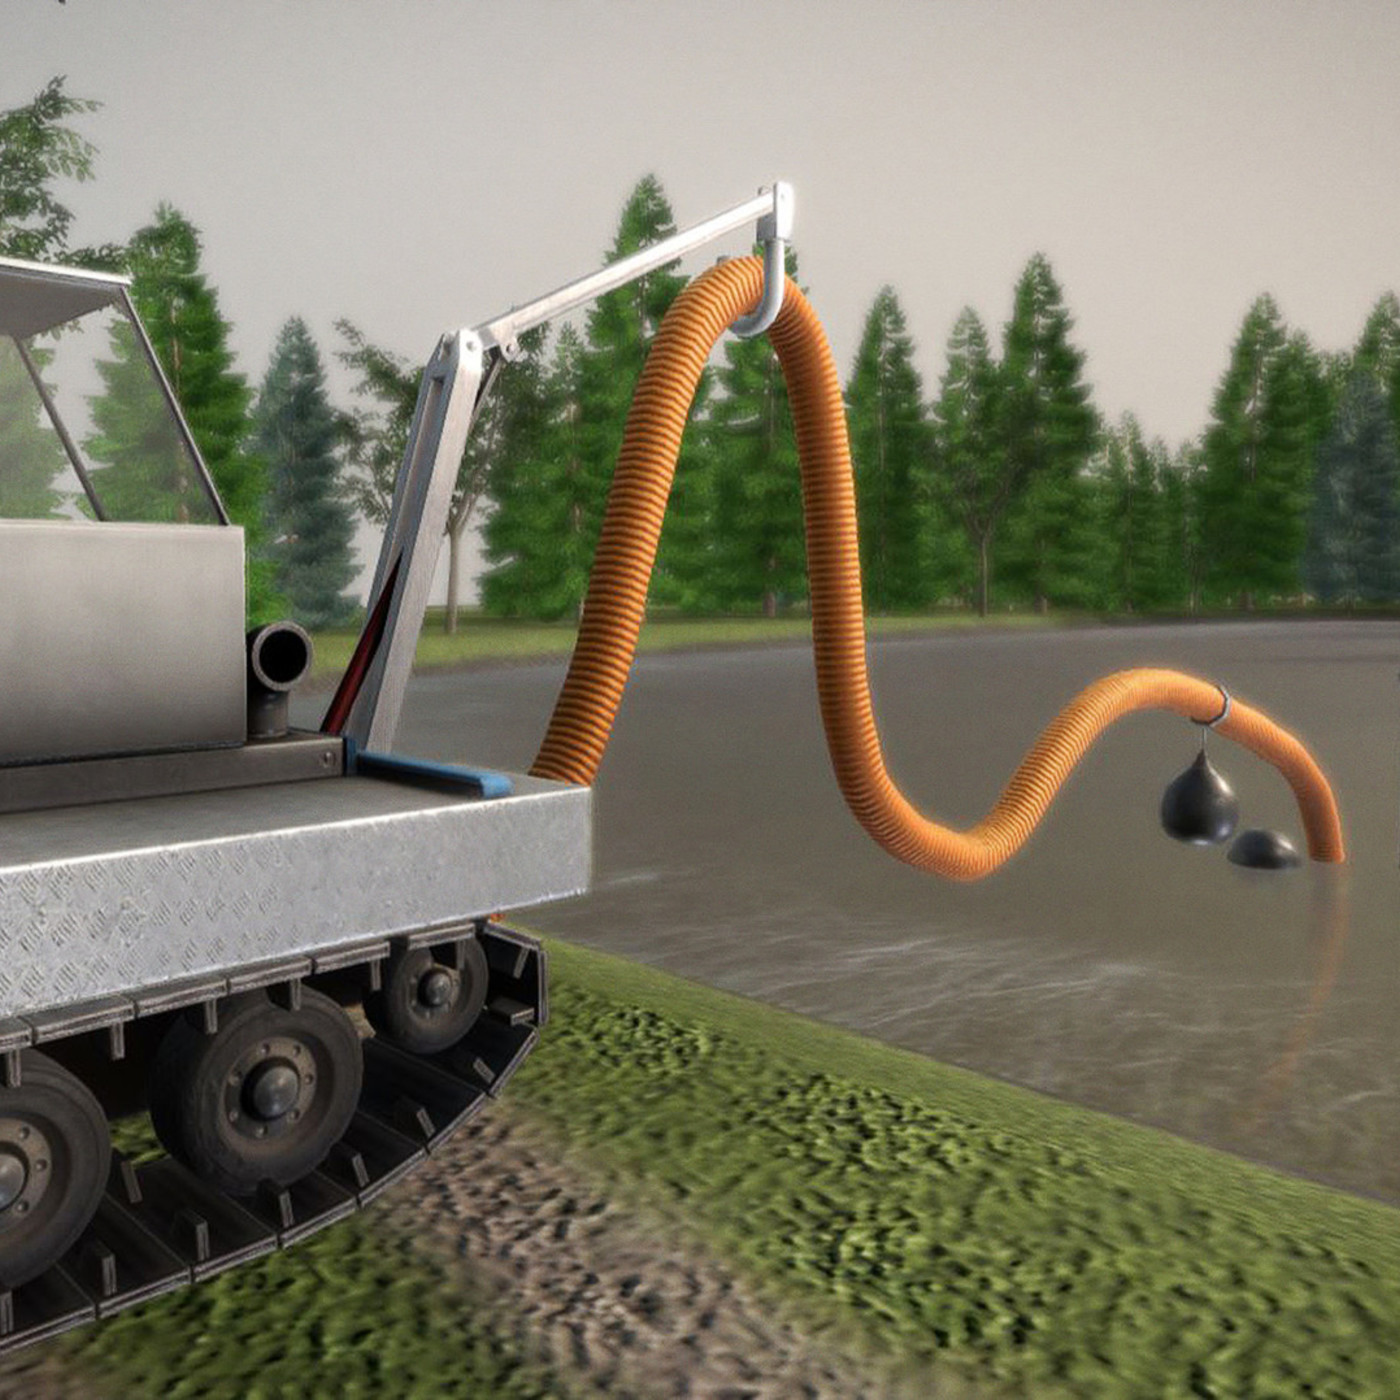 Desludging Robot in Action